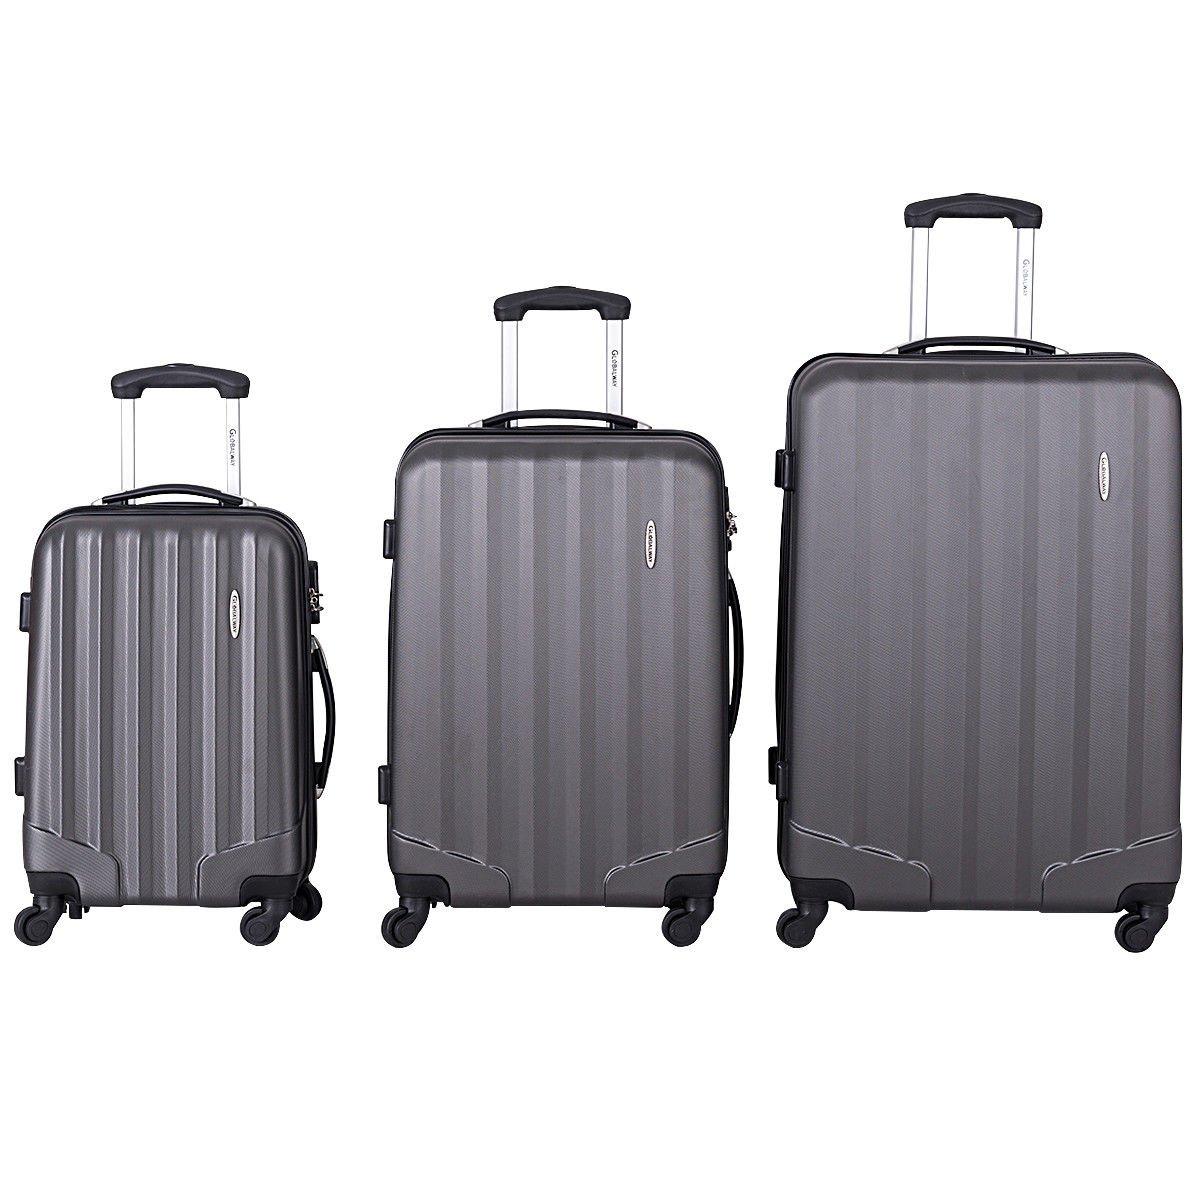 Giantex Globalway 3 Pcs Luggage Set Bag Travel ABS Trolley Suitcase w/TSA Lock Black (Gray)